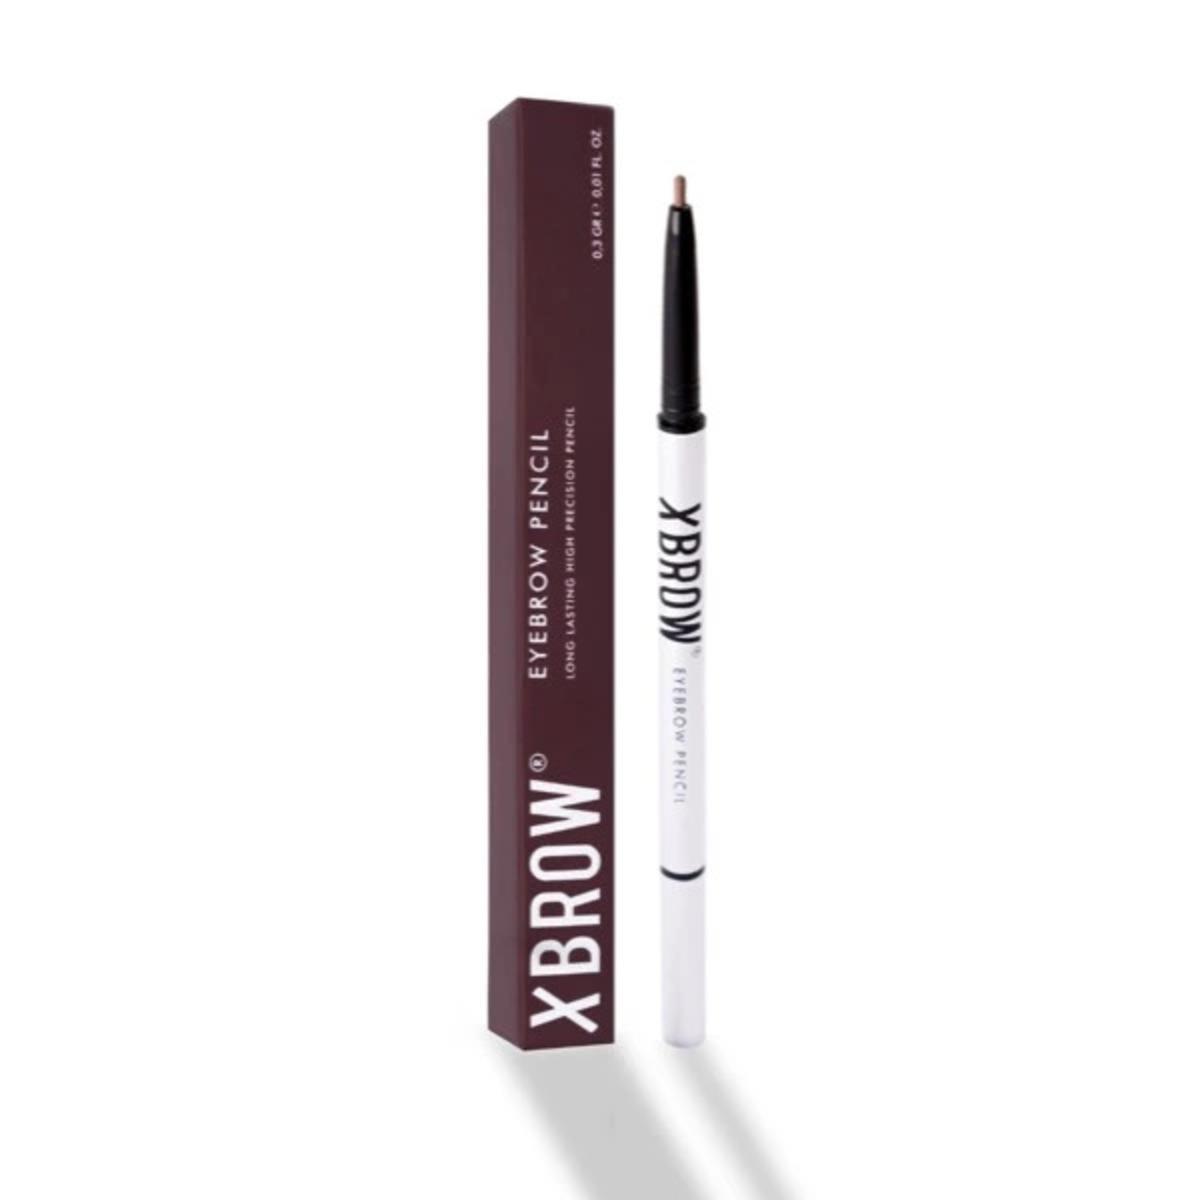 Xbrow Eyebrow Pencil